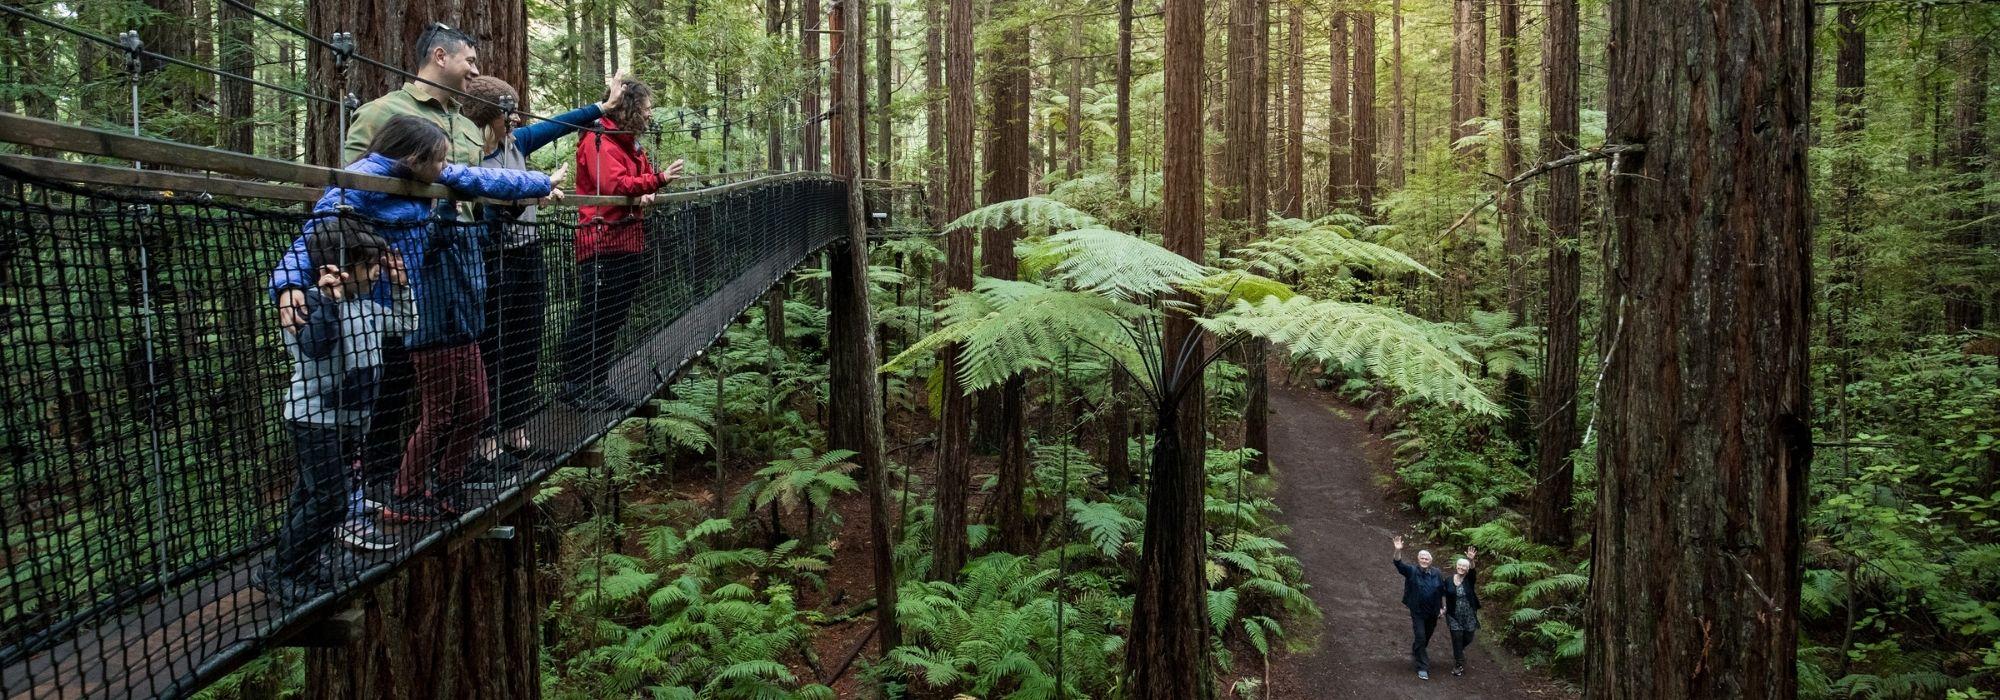 Three-day itinerary for a fun-packed family holiday in Rotorua